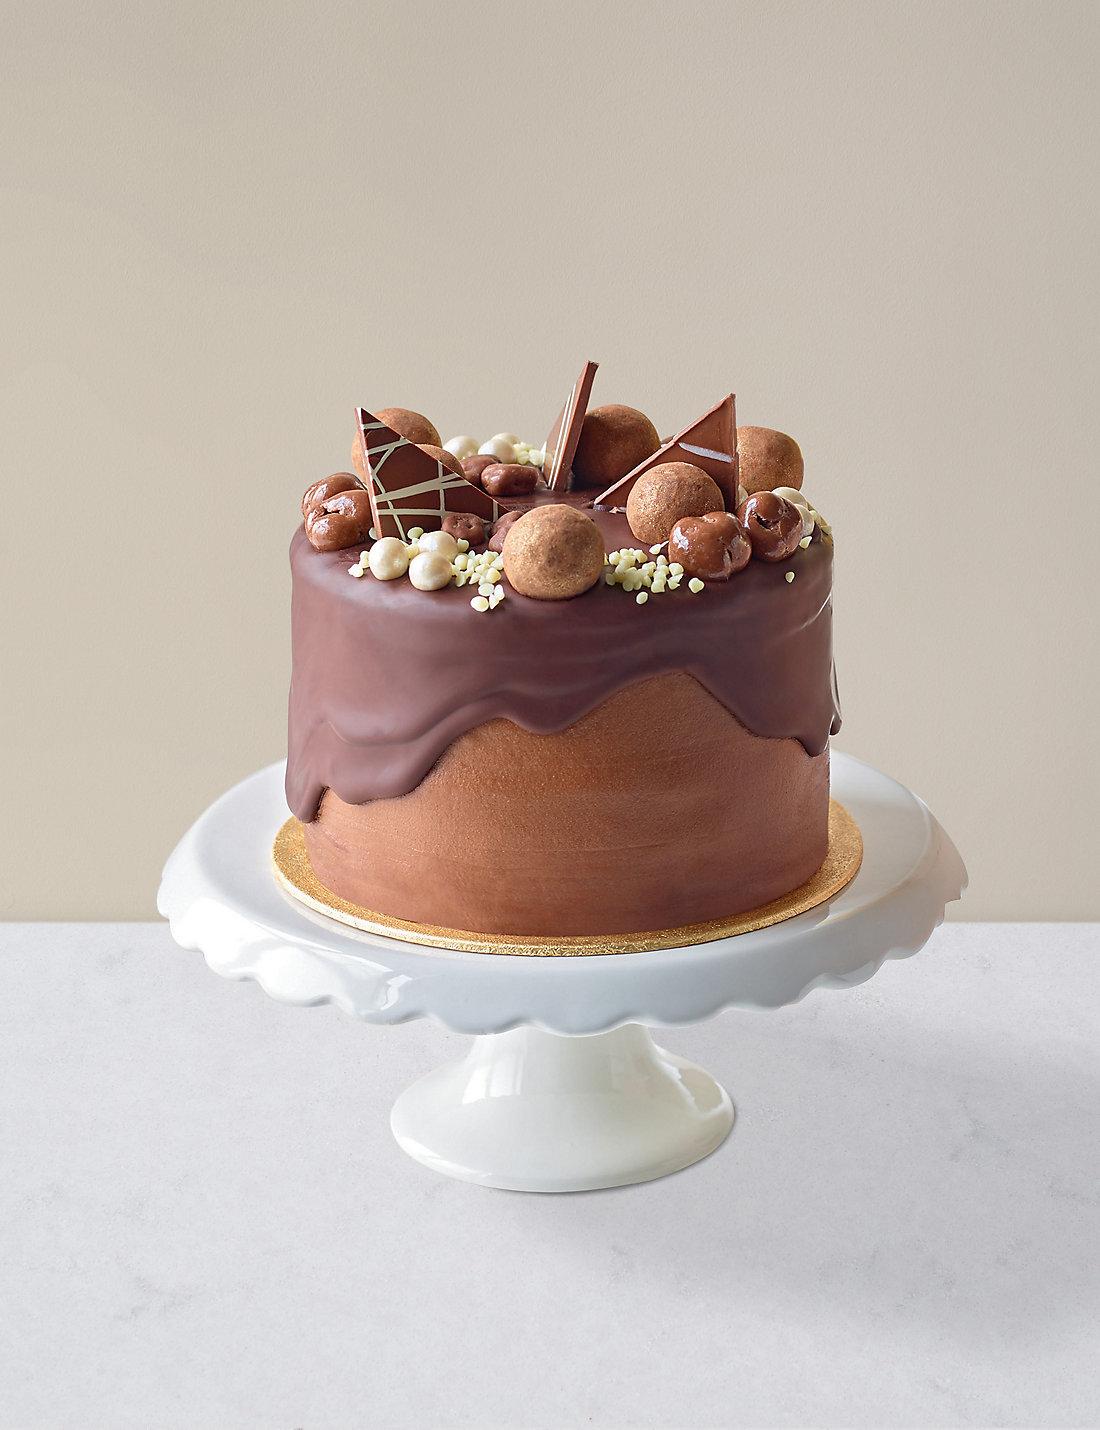 Chocolate Caramel Dribble Cake